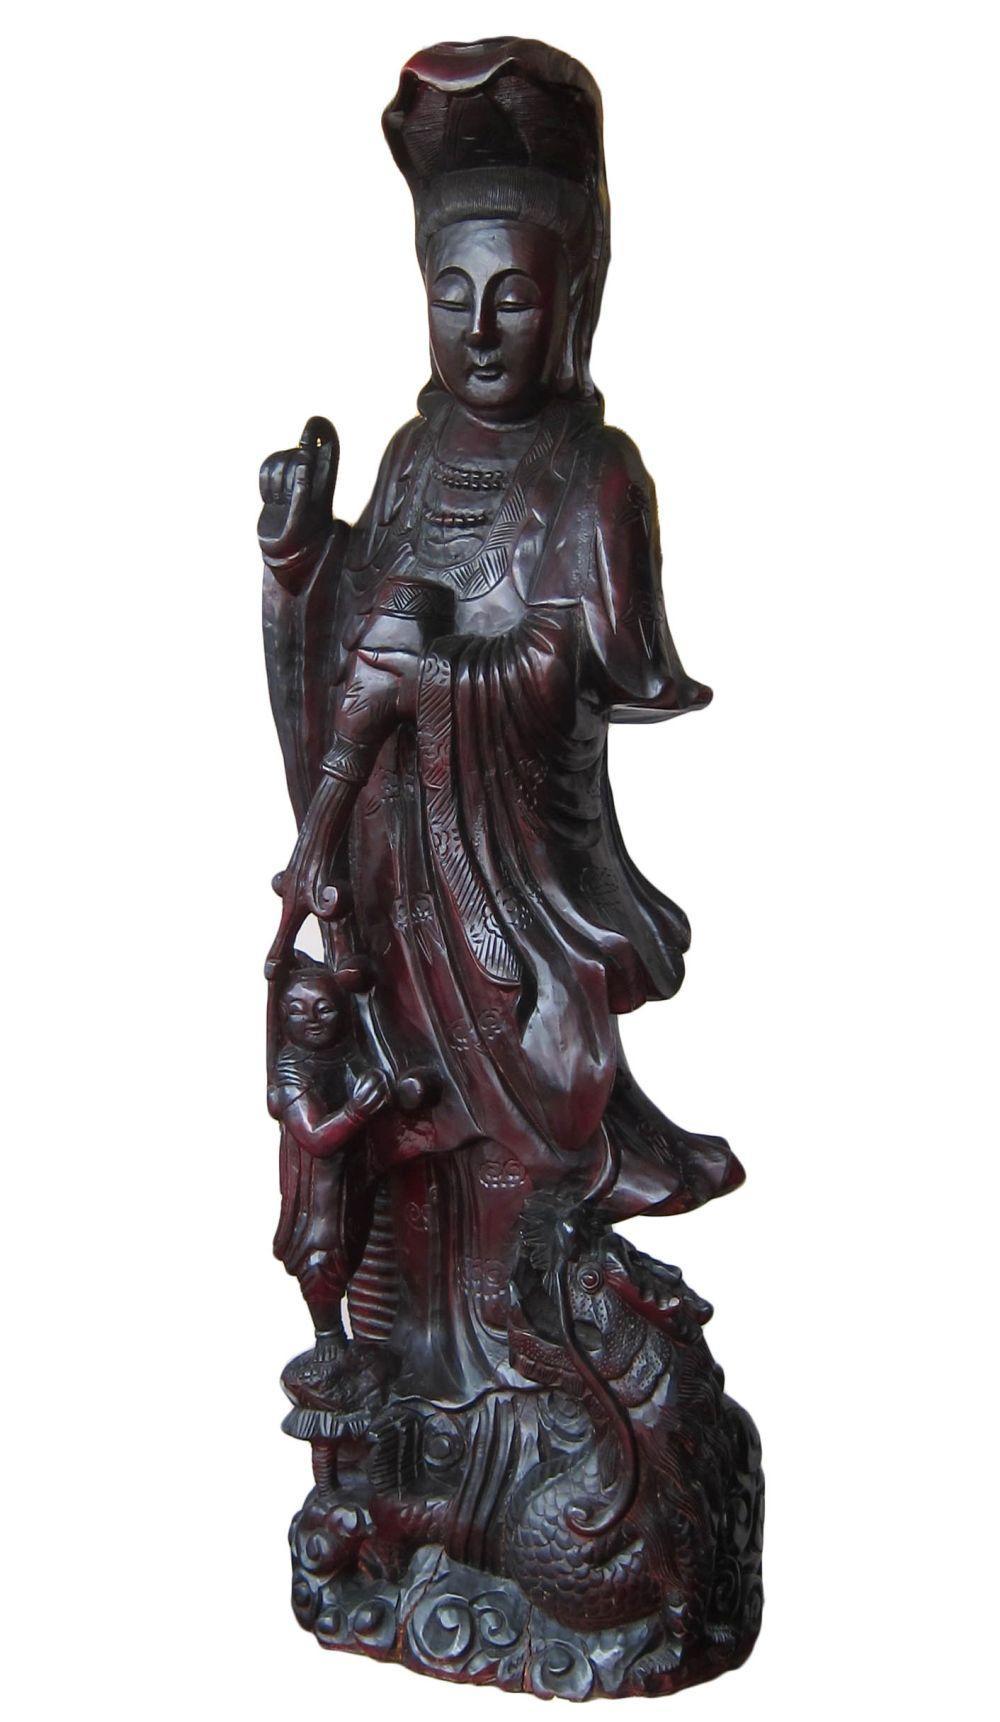 Vintage Chinese wood carving